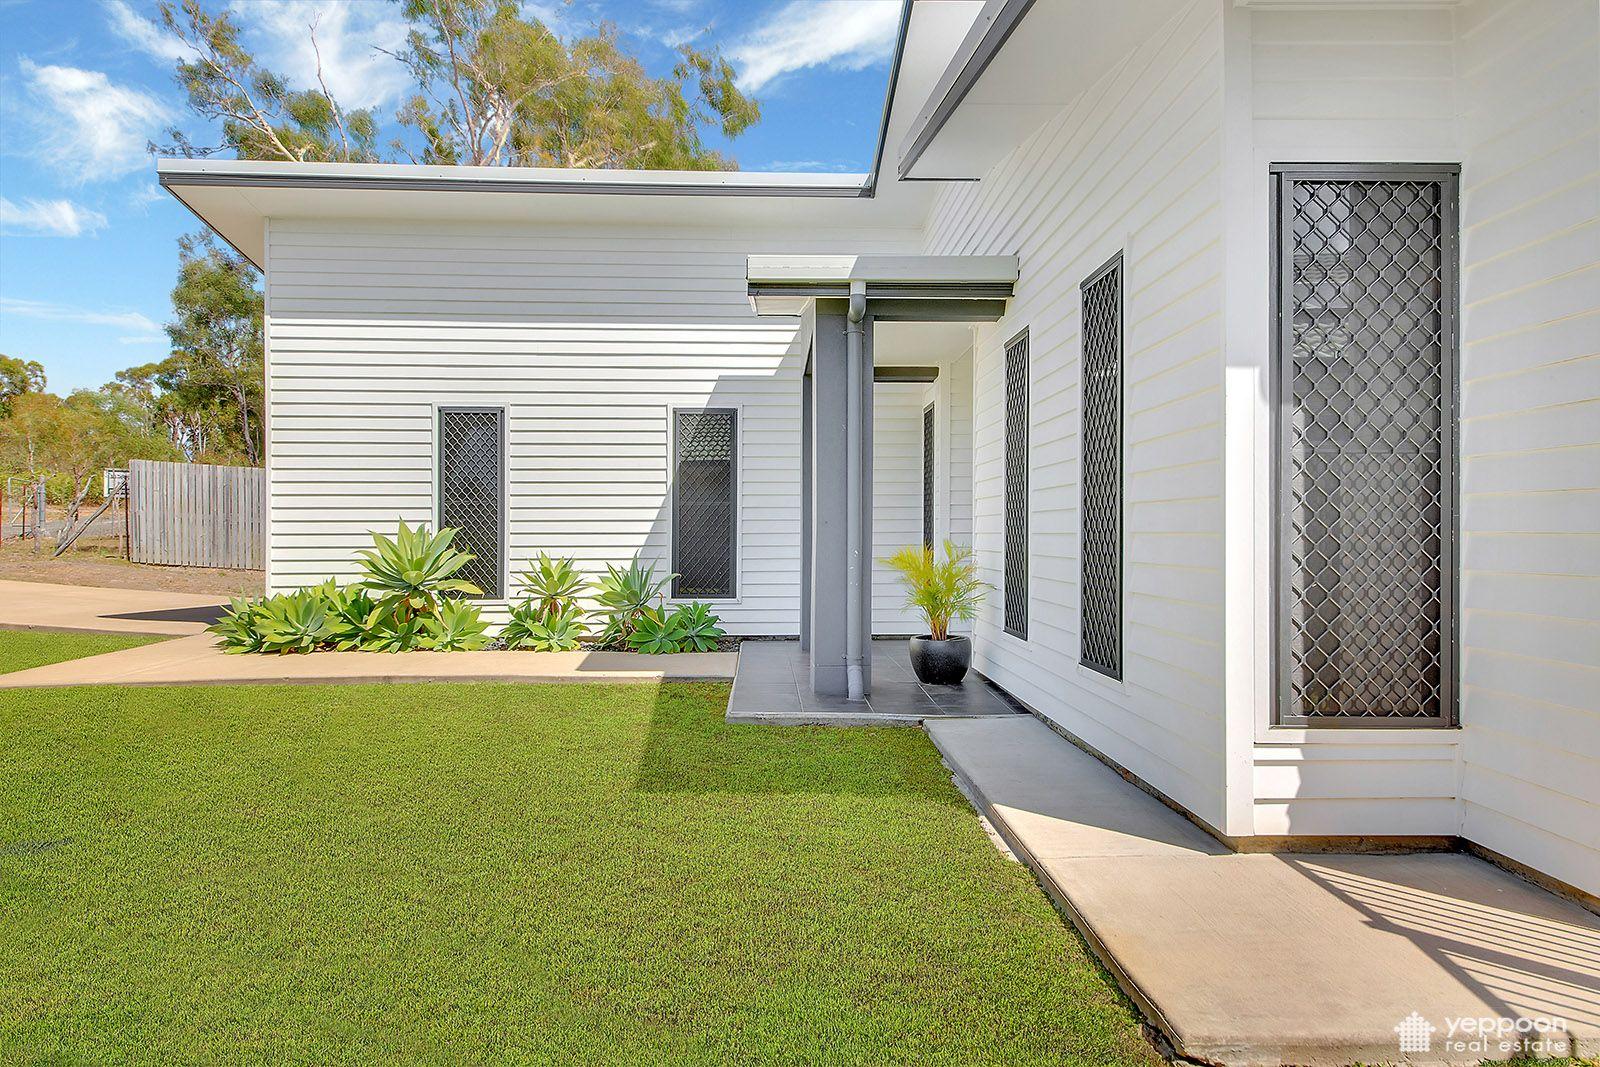 30 Frangipani Drive, Lammermoor QLD 4703, Image 0